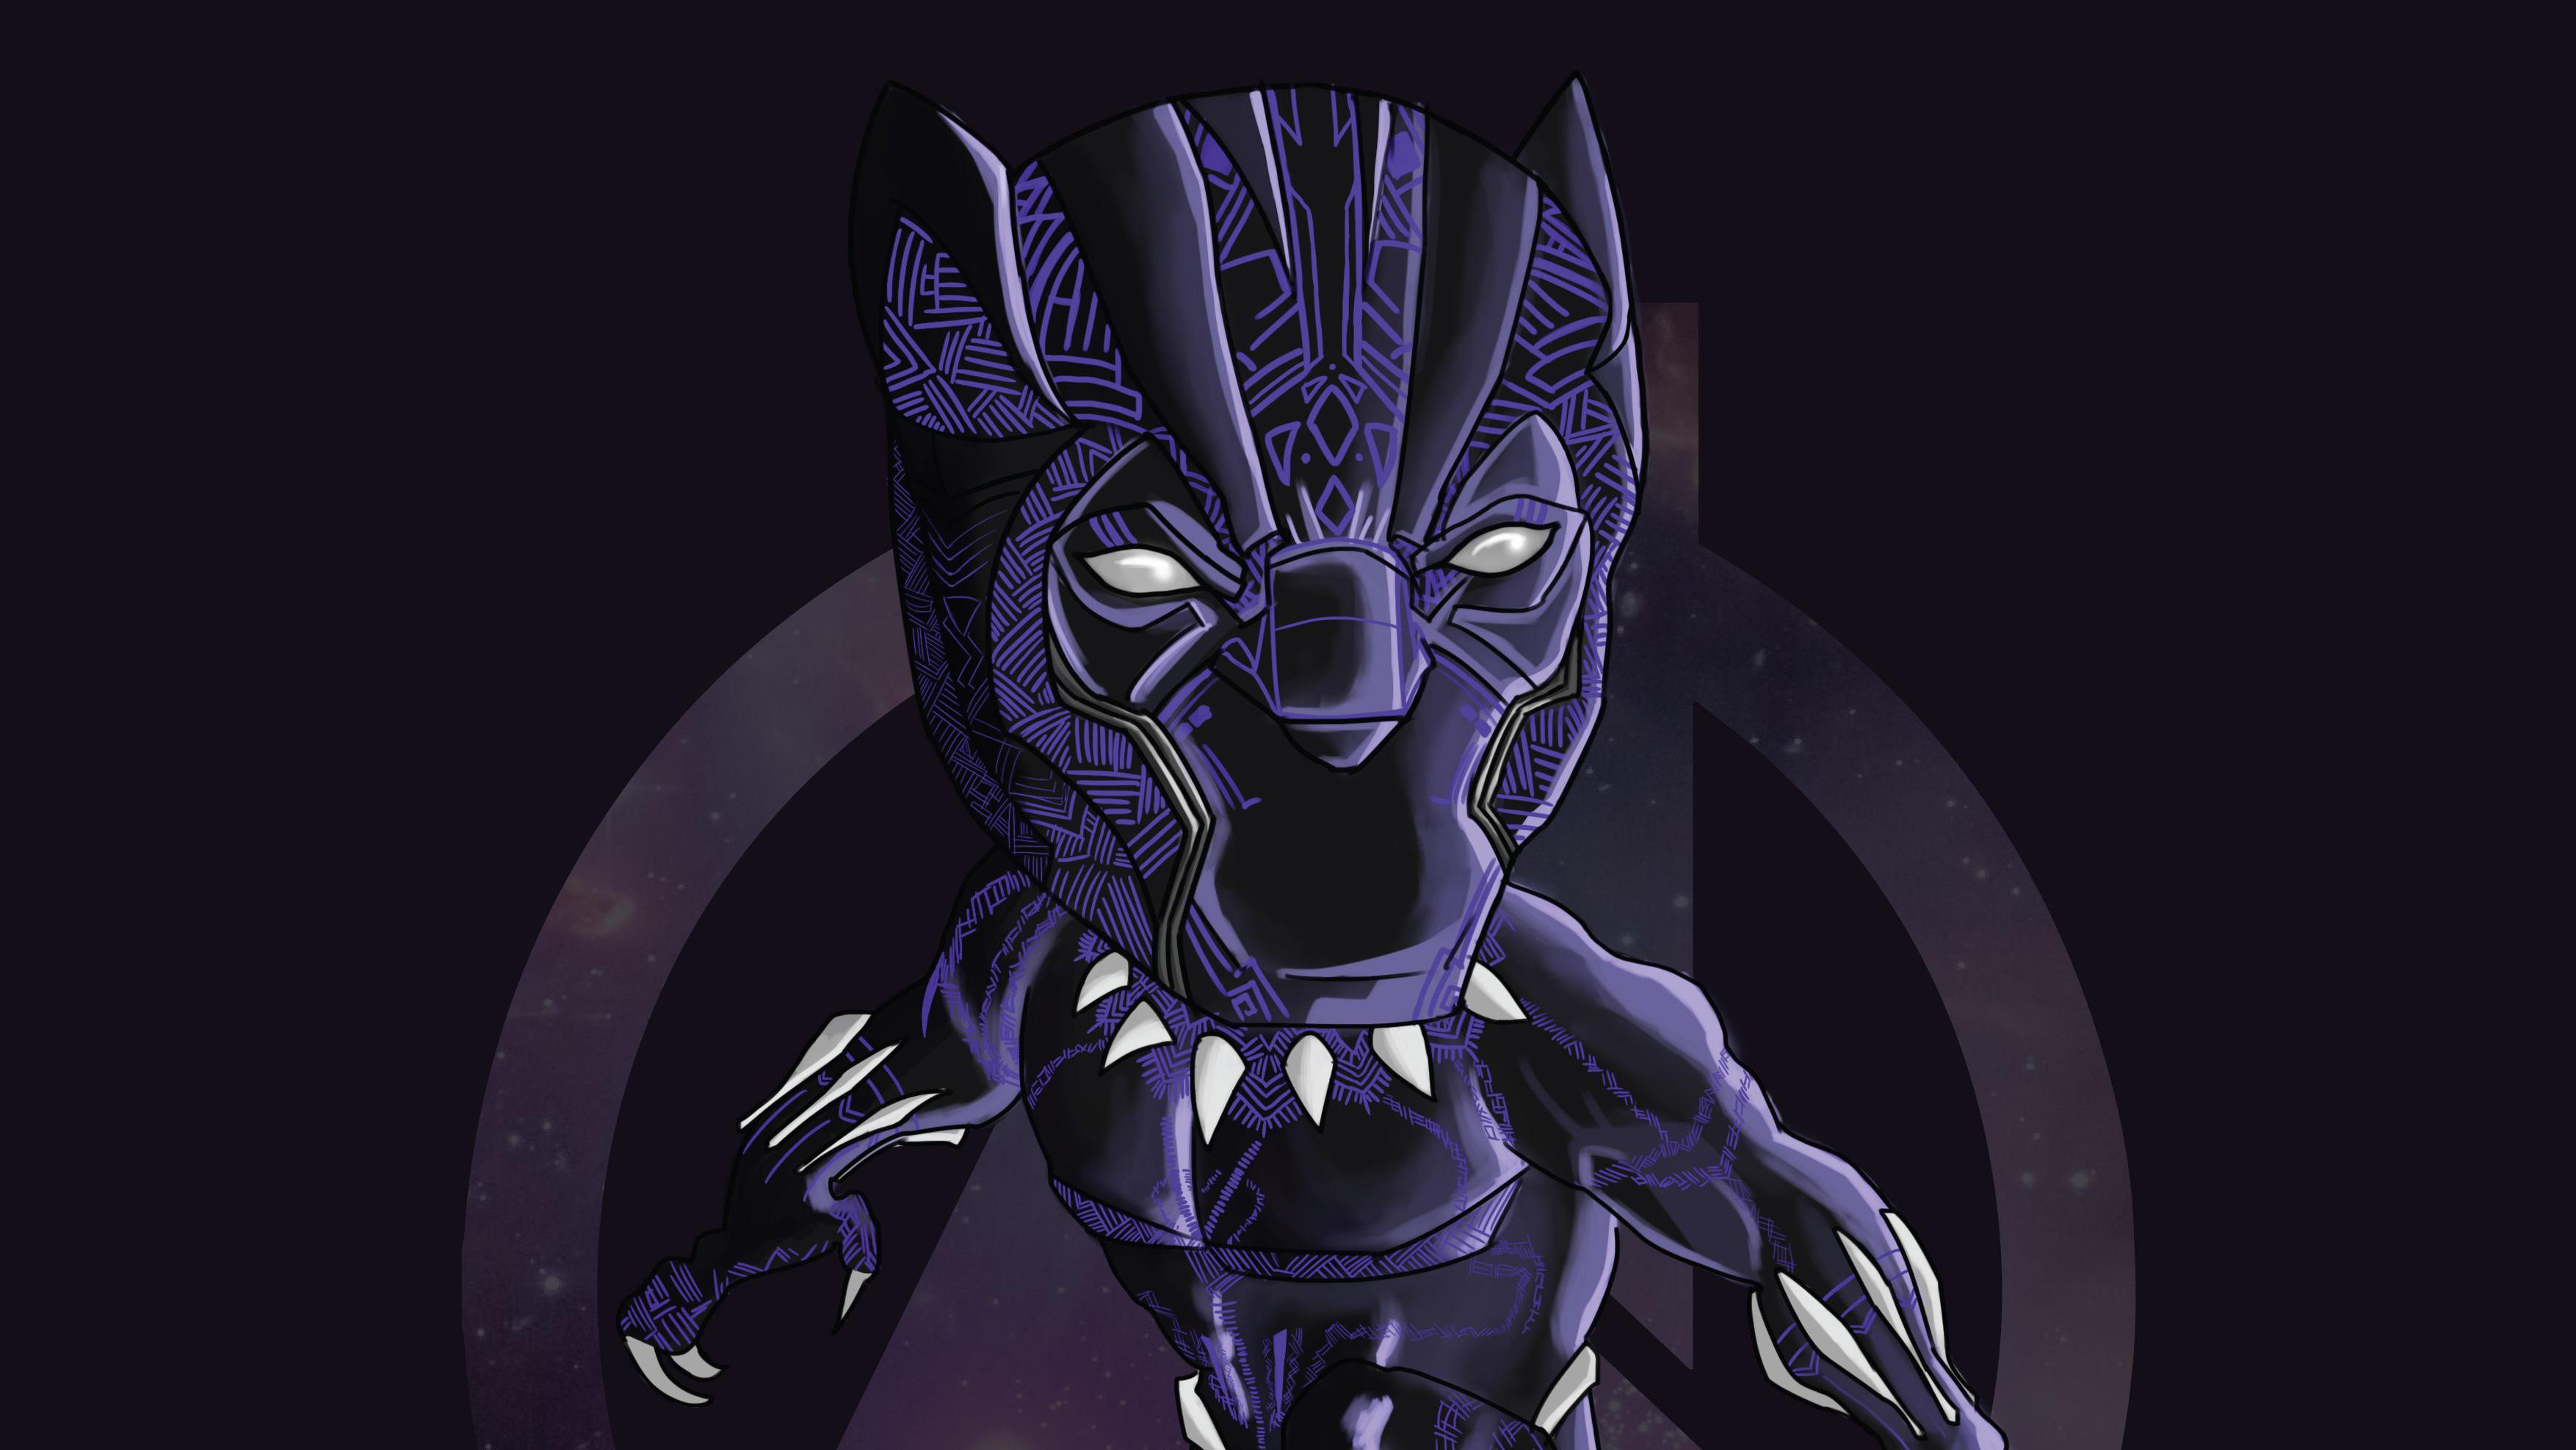 Black Panther Doodle Art Hd Superheroes 4k Wallpapers